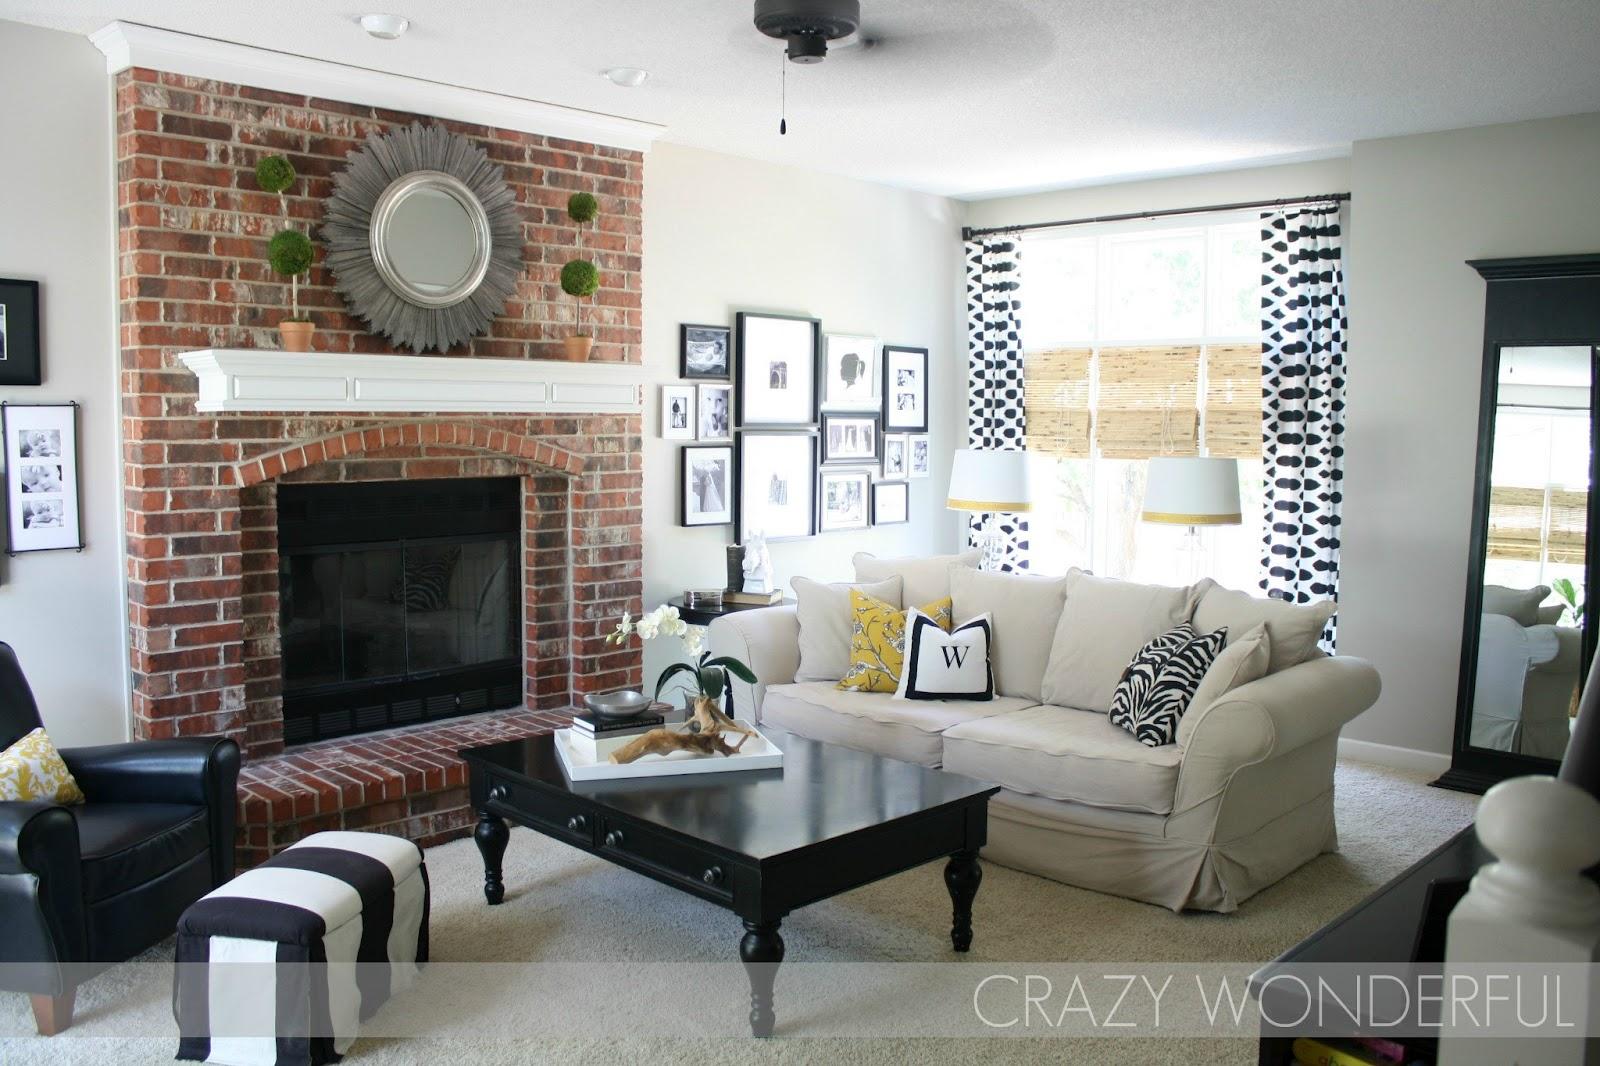 living room paint - Crazy Wonderful